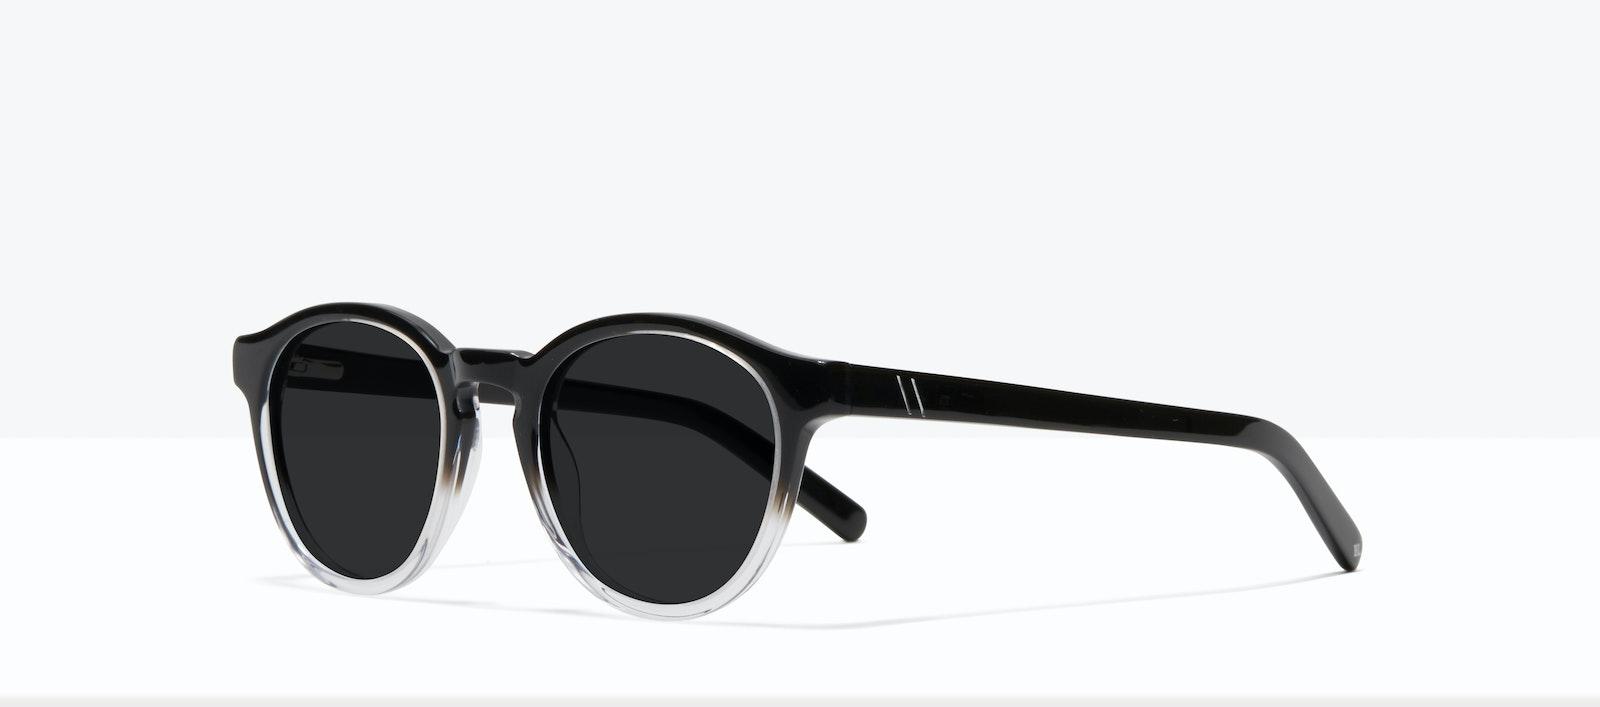 Affordable Fashion Glasses Round Sunglasses Men Gent S Onyx Clear Tilt